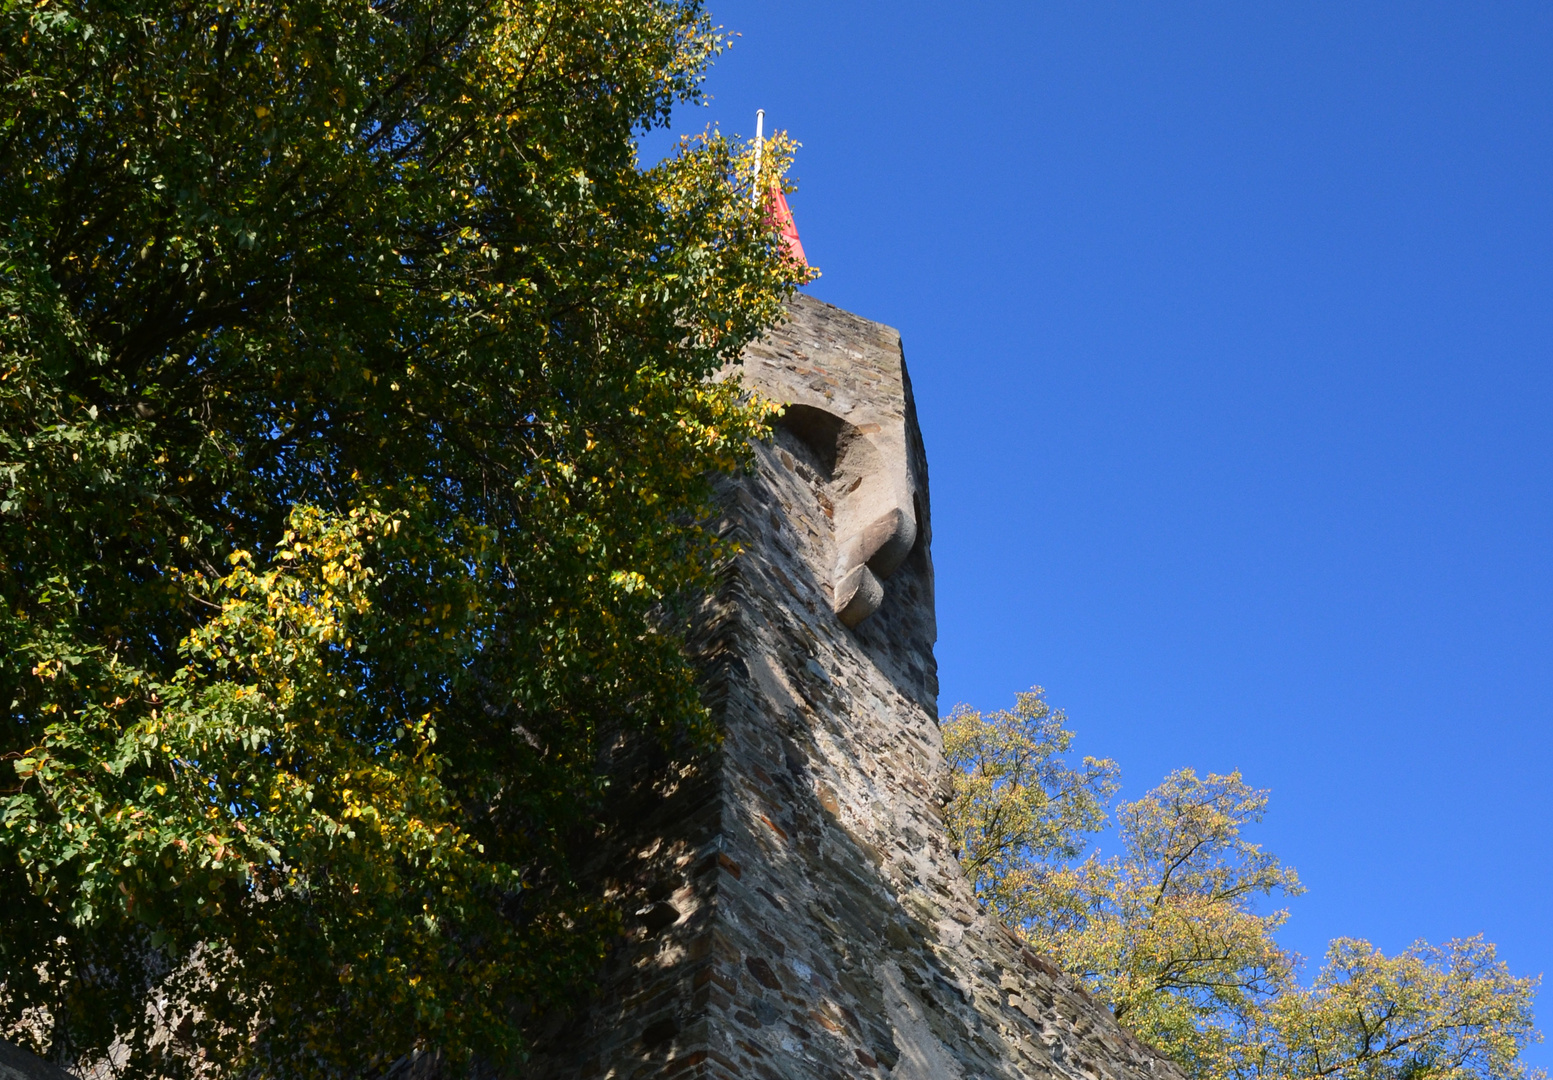 Wächter im Turm oder Turm als Wächter